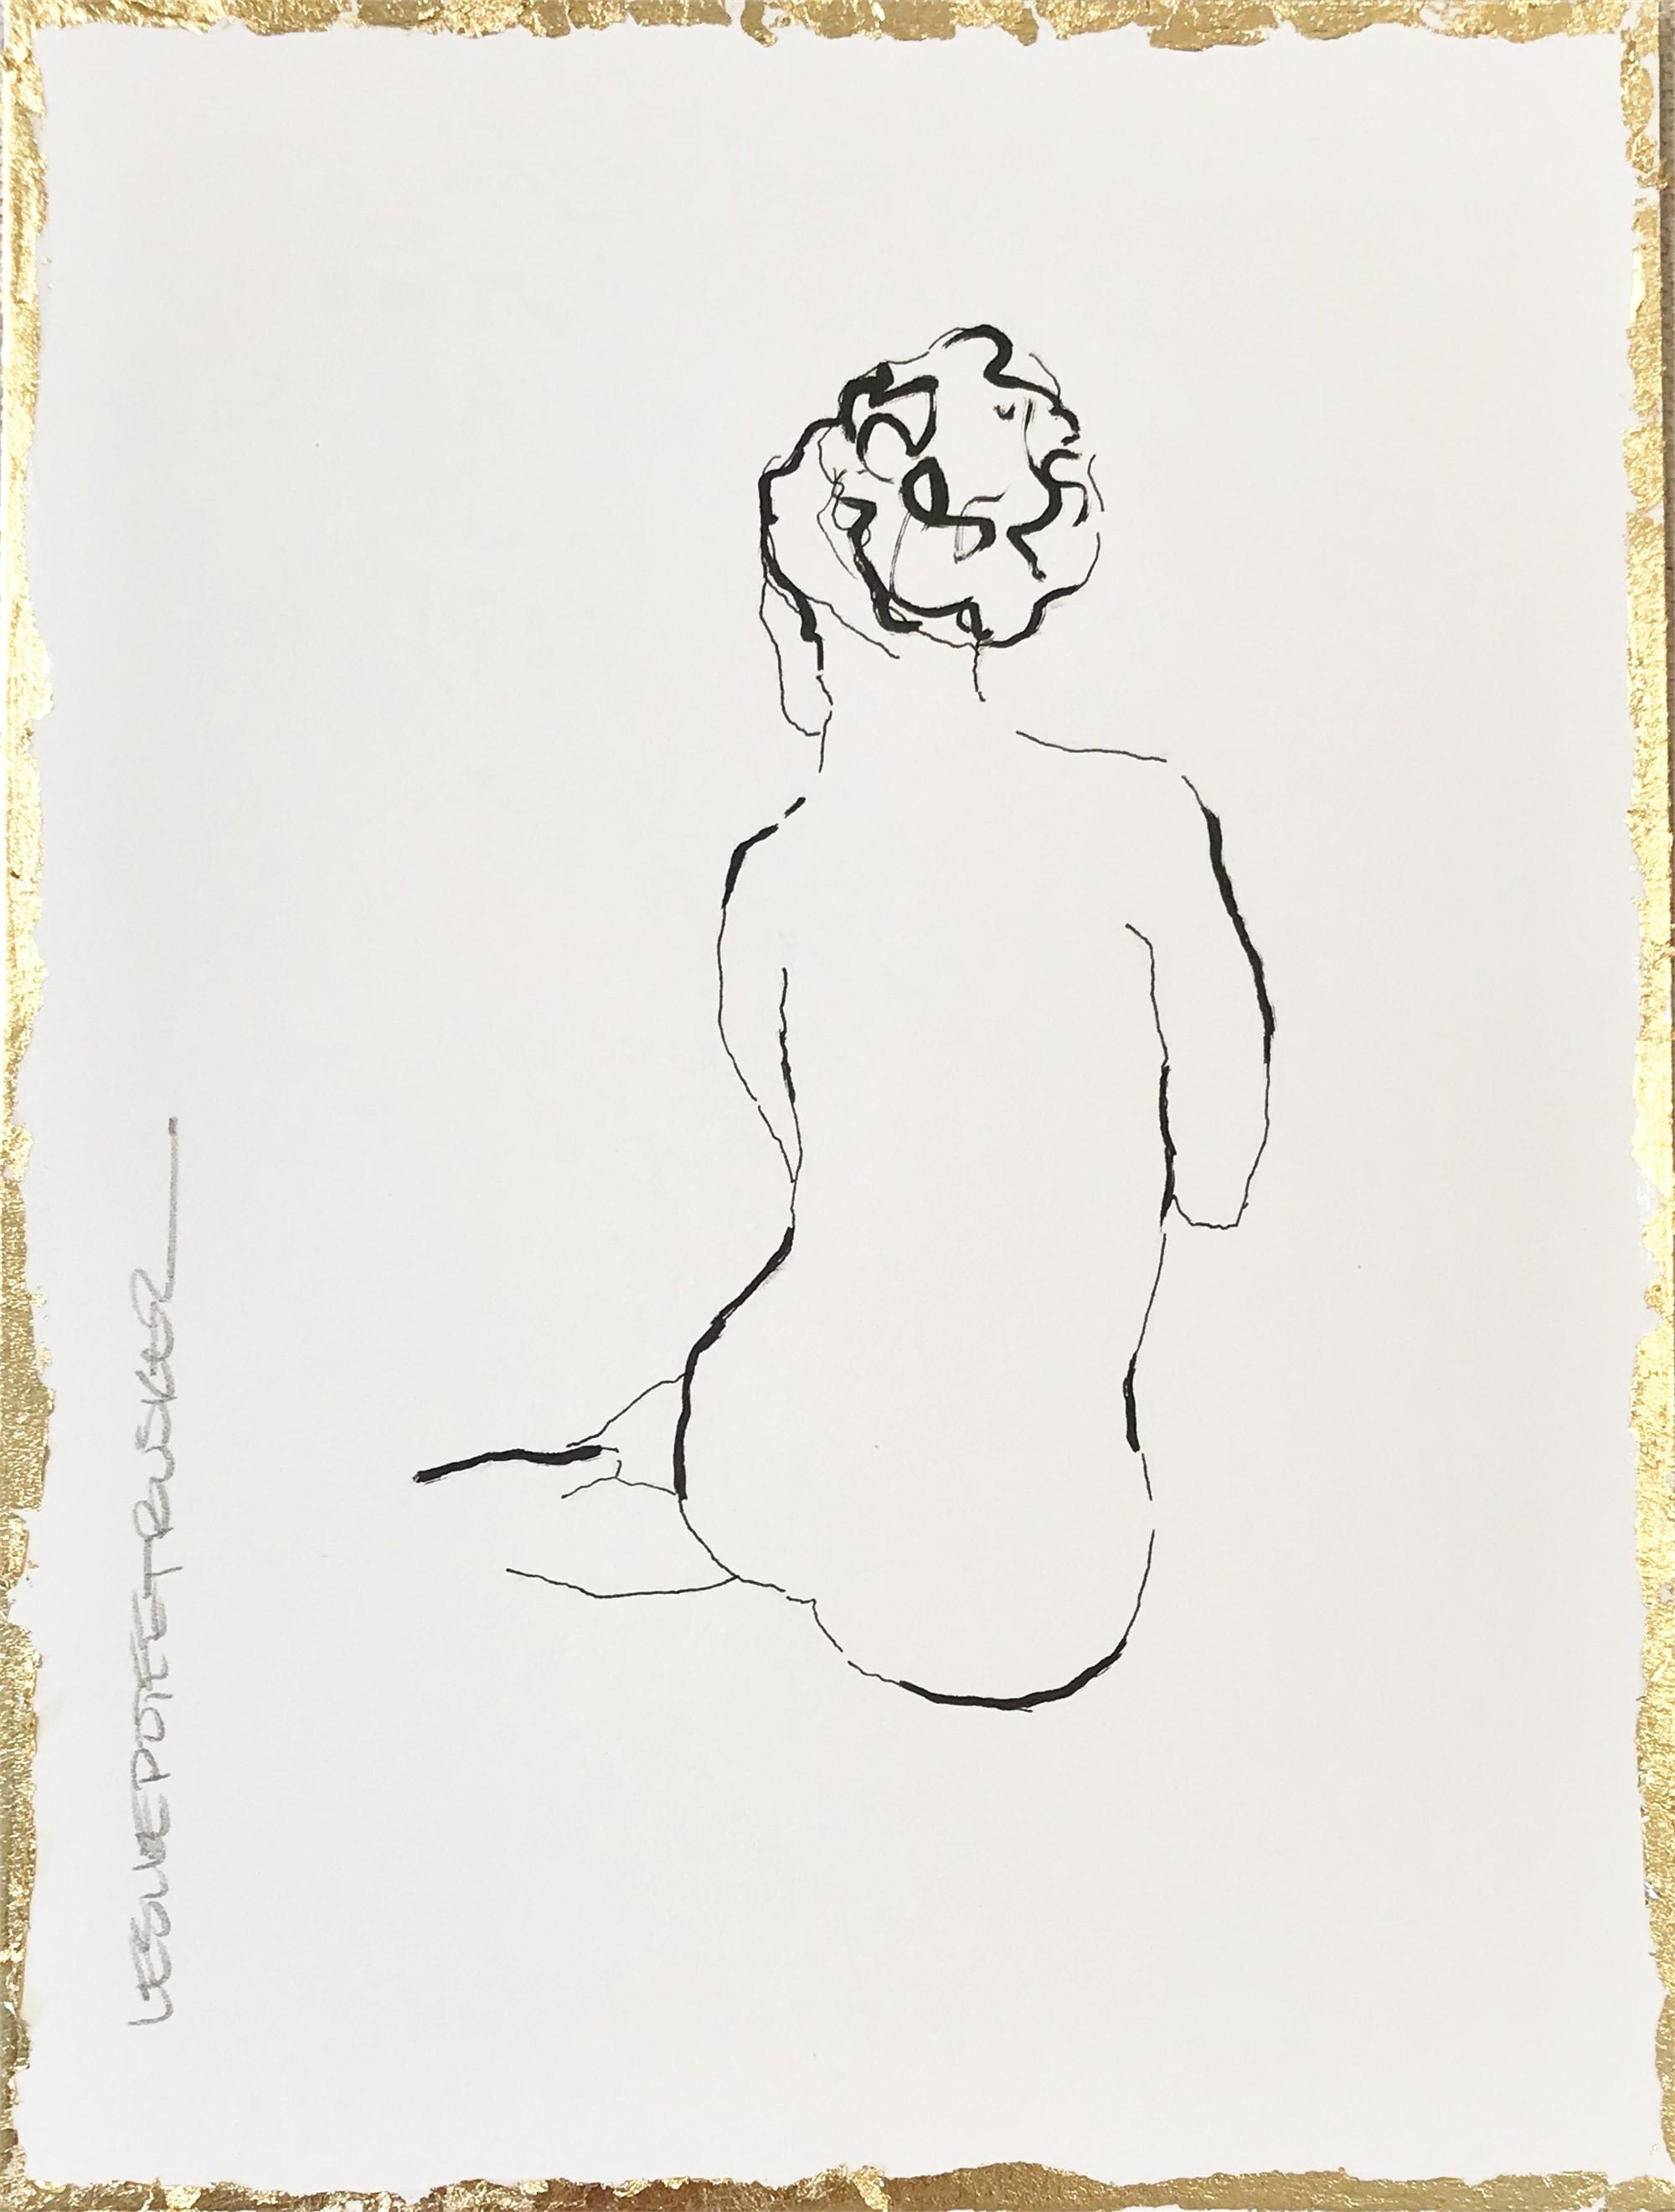 Figure No. 81 by Leslie Poteet Busker